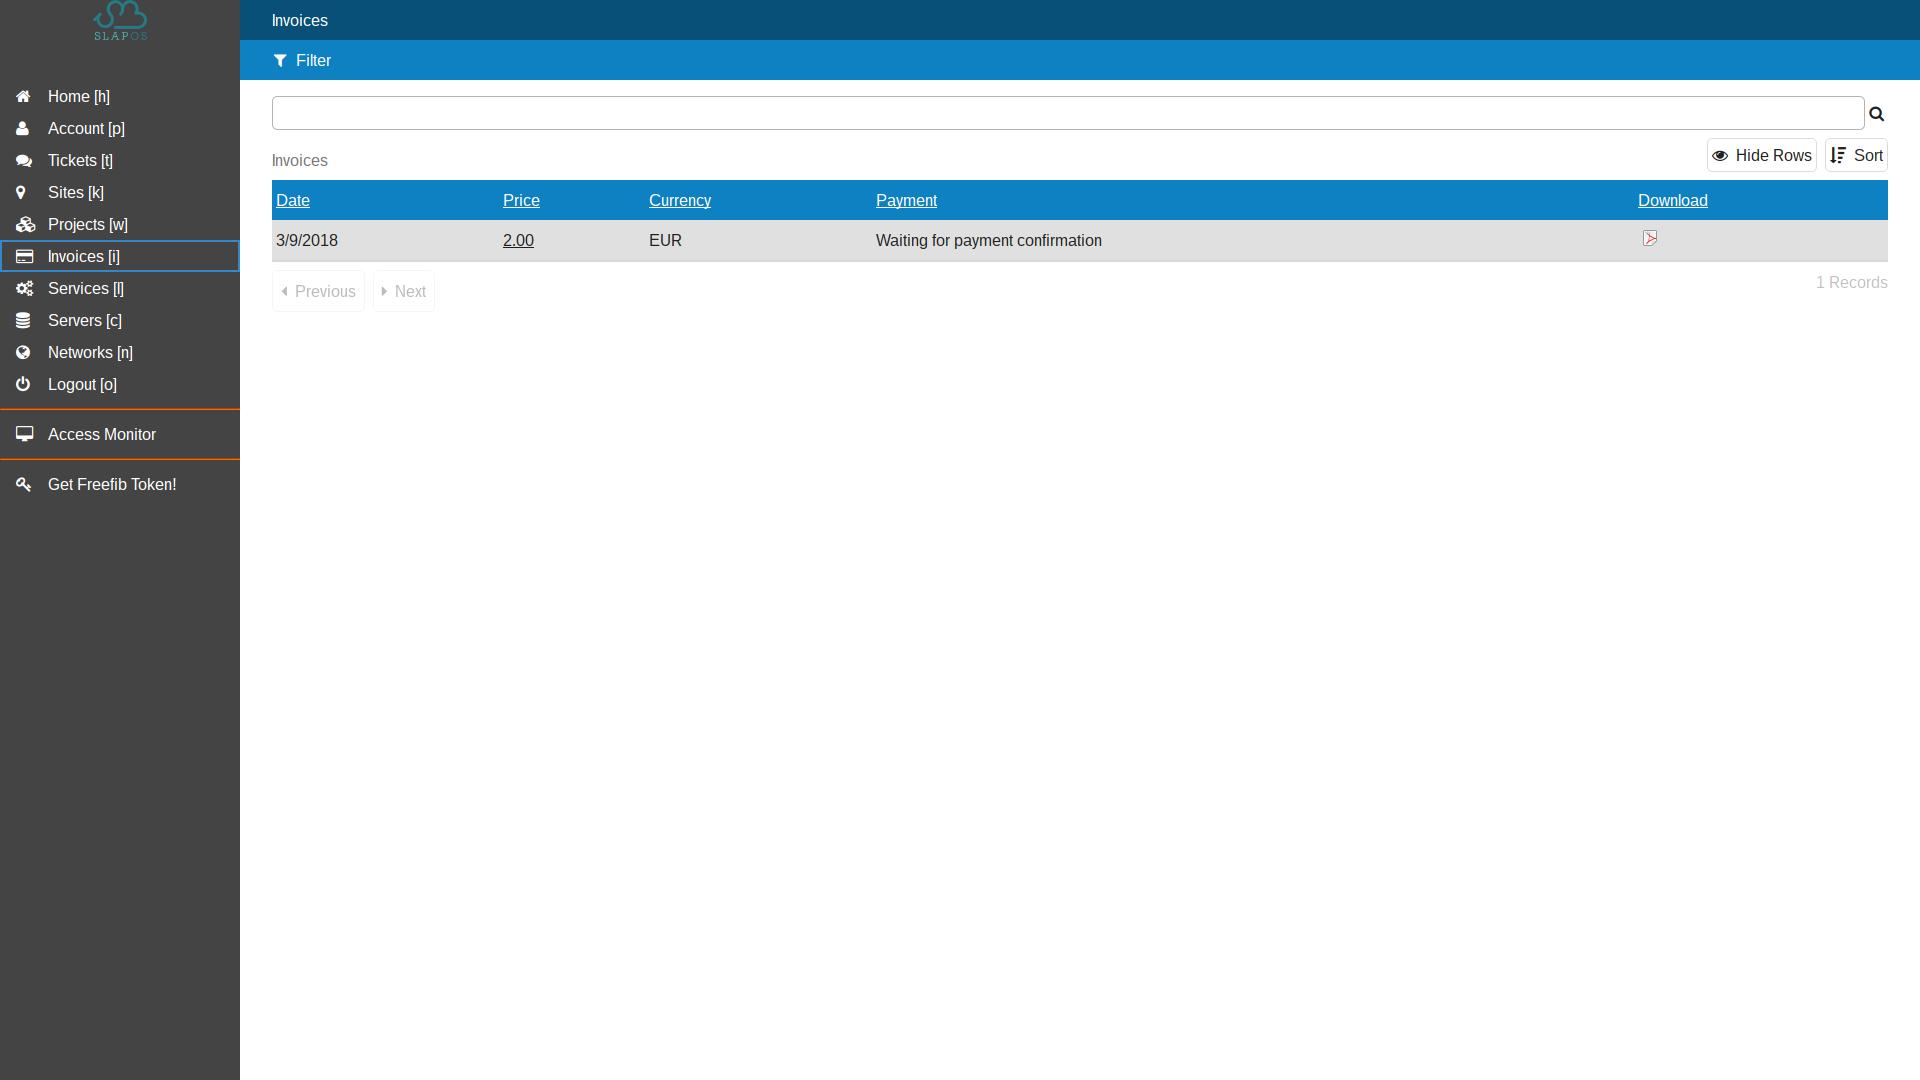 Vifib Interface - List of invoices